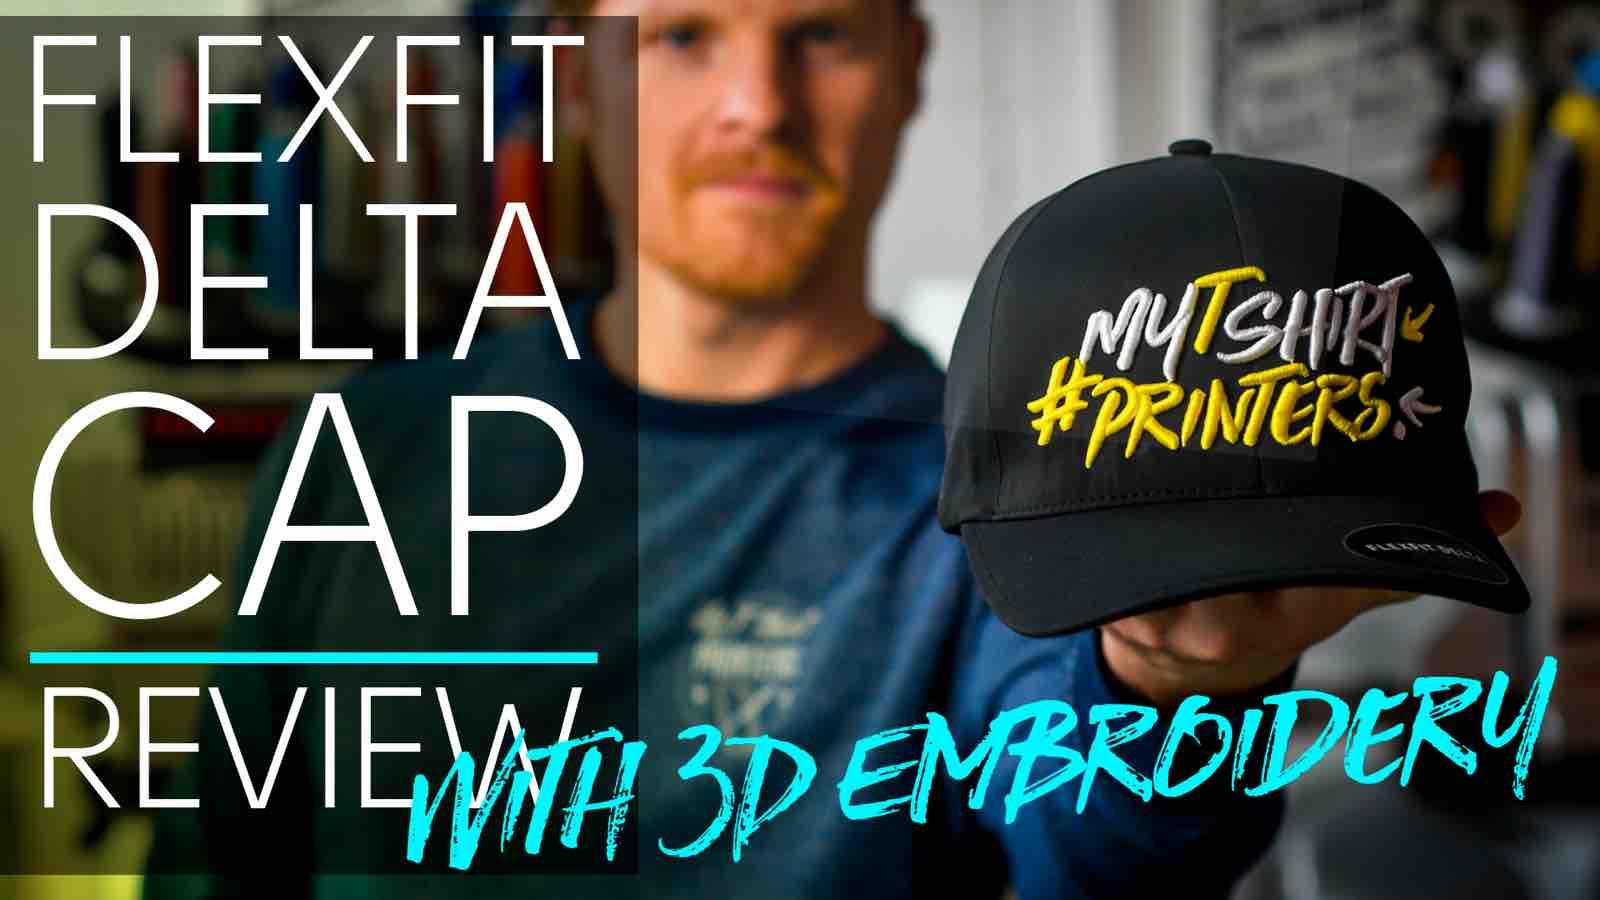 flexfit delta cap 3d embroidery review